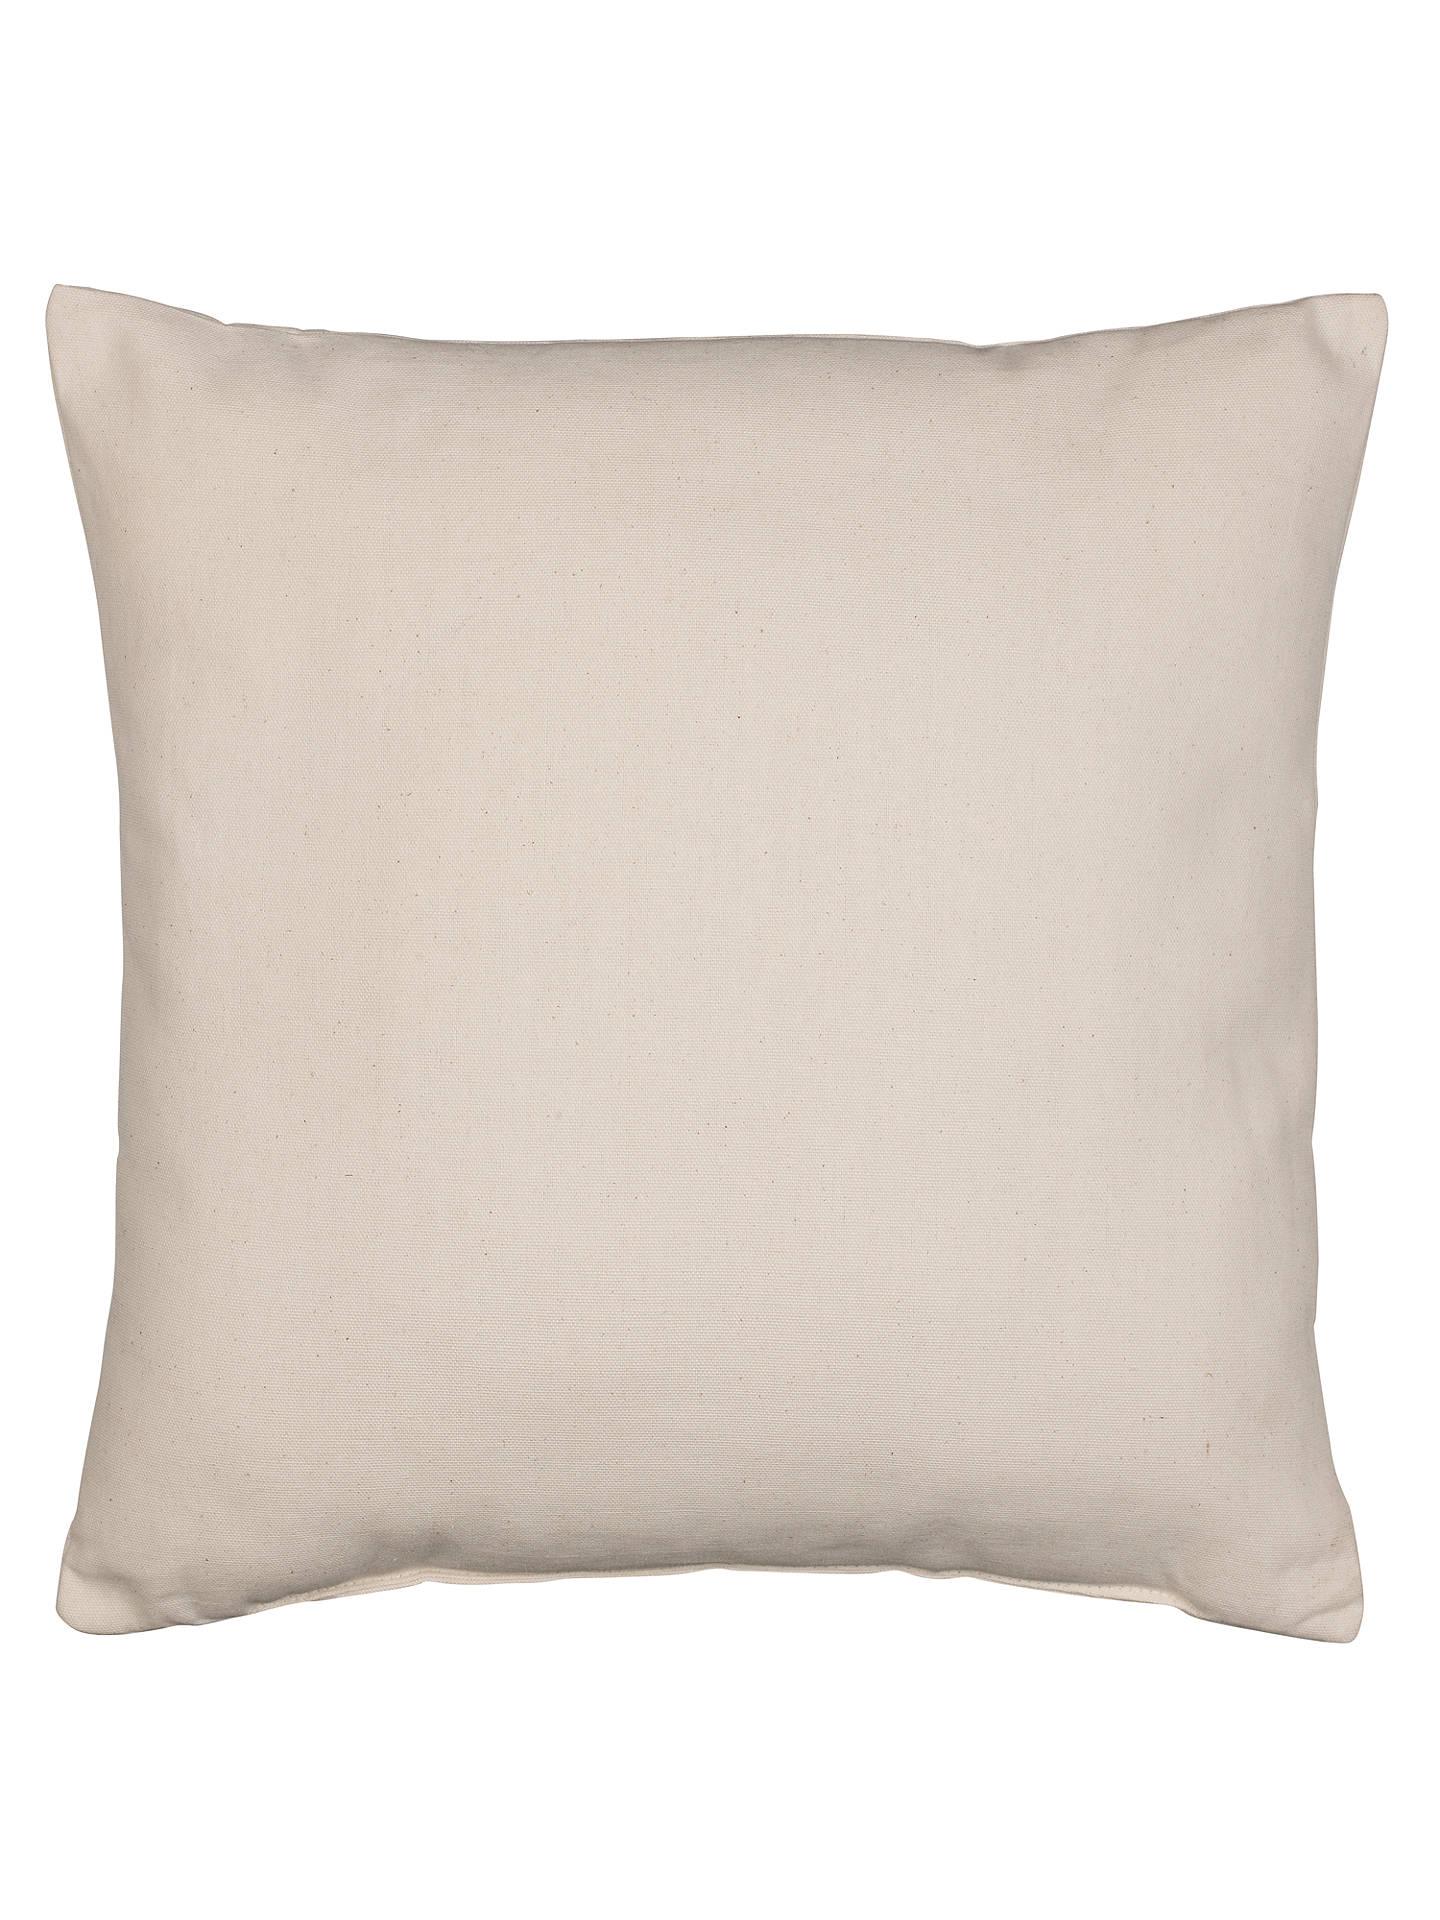 john lewis the basics plain cotton cushion at john lewis. Black Bedroom Furniture Sets. Home Design Ideas